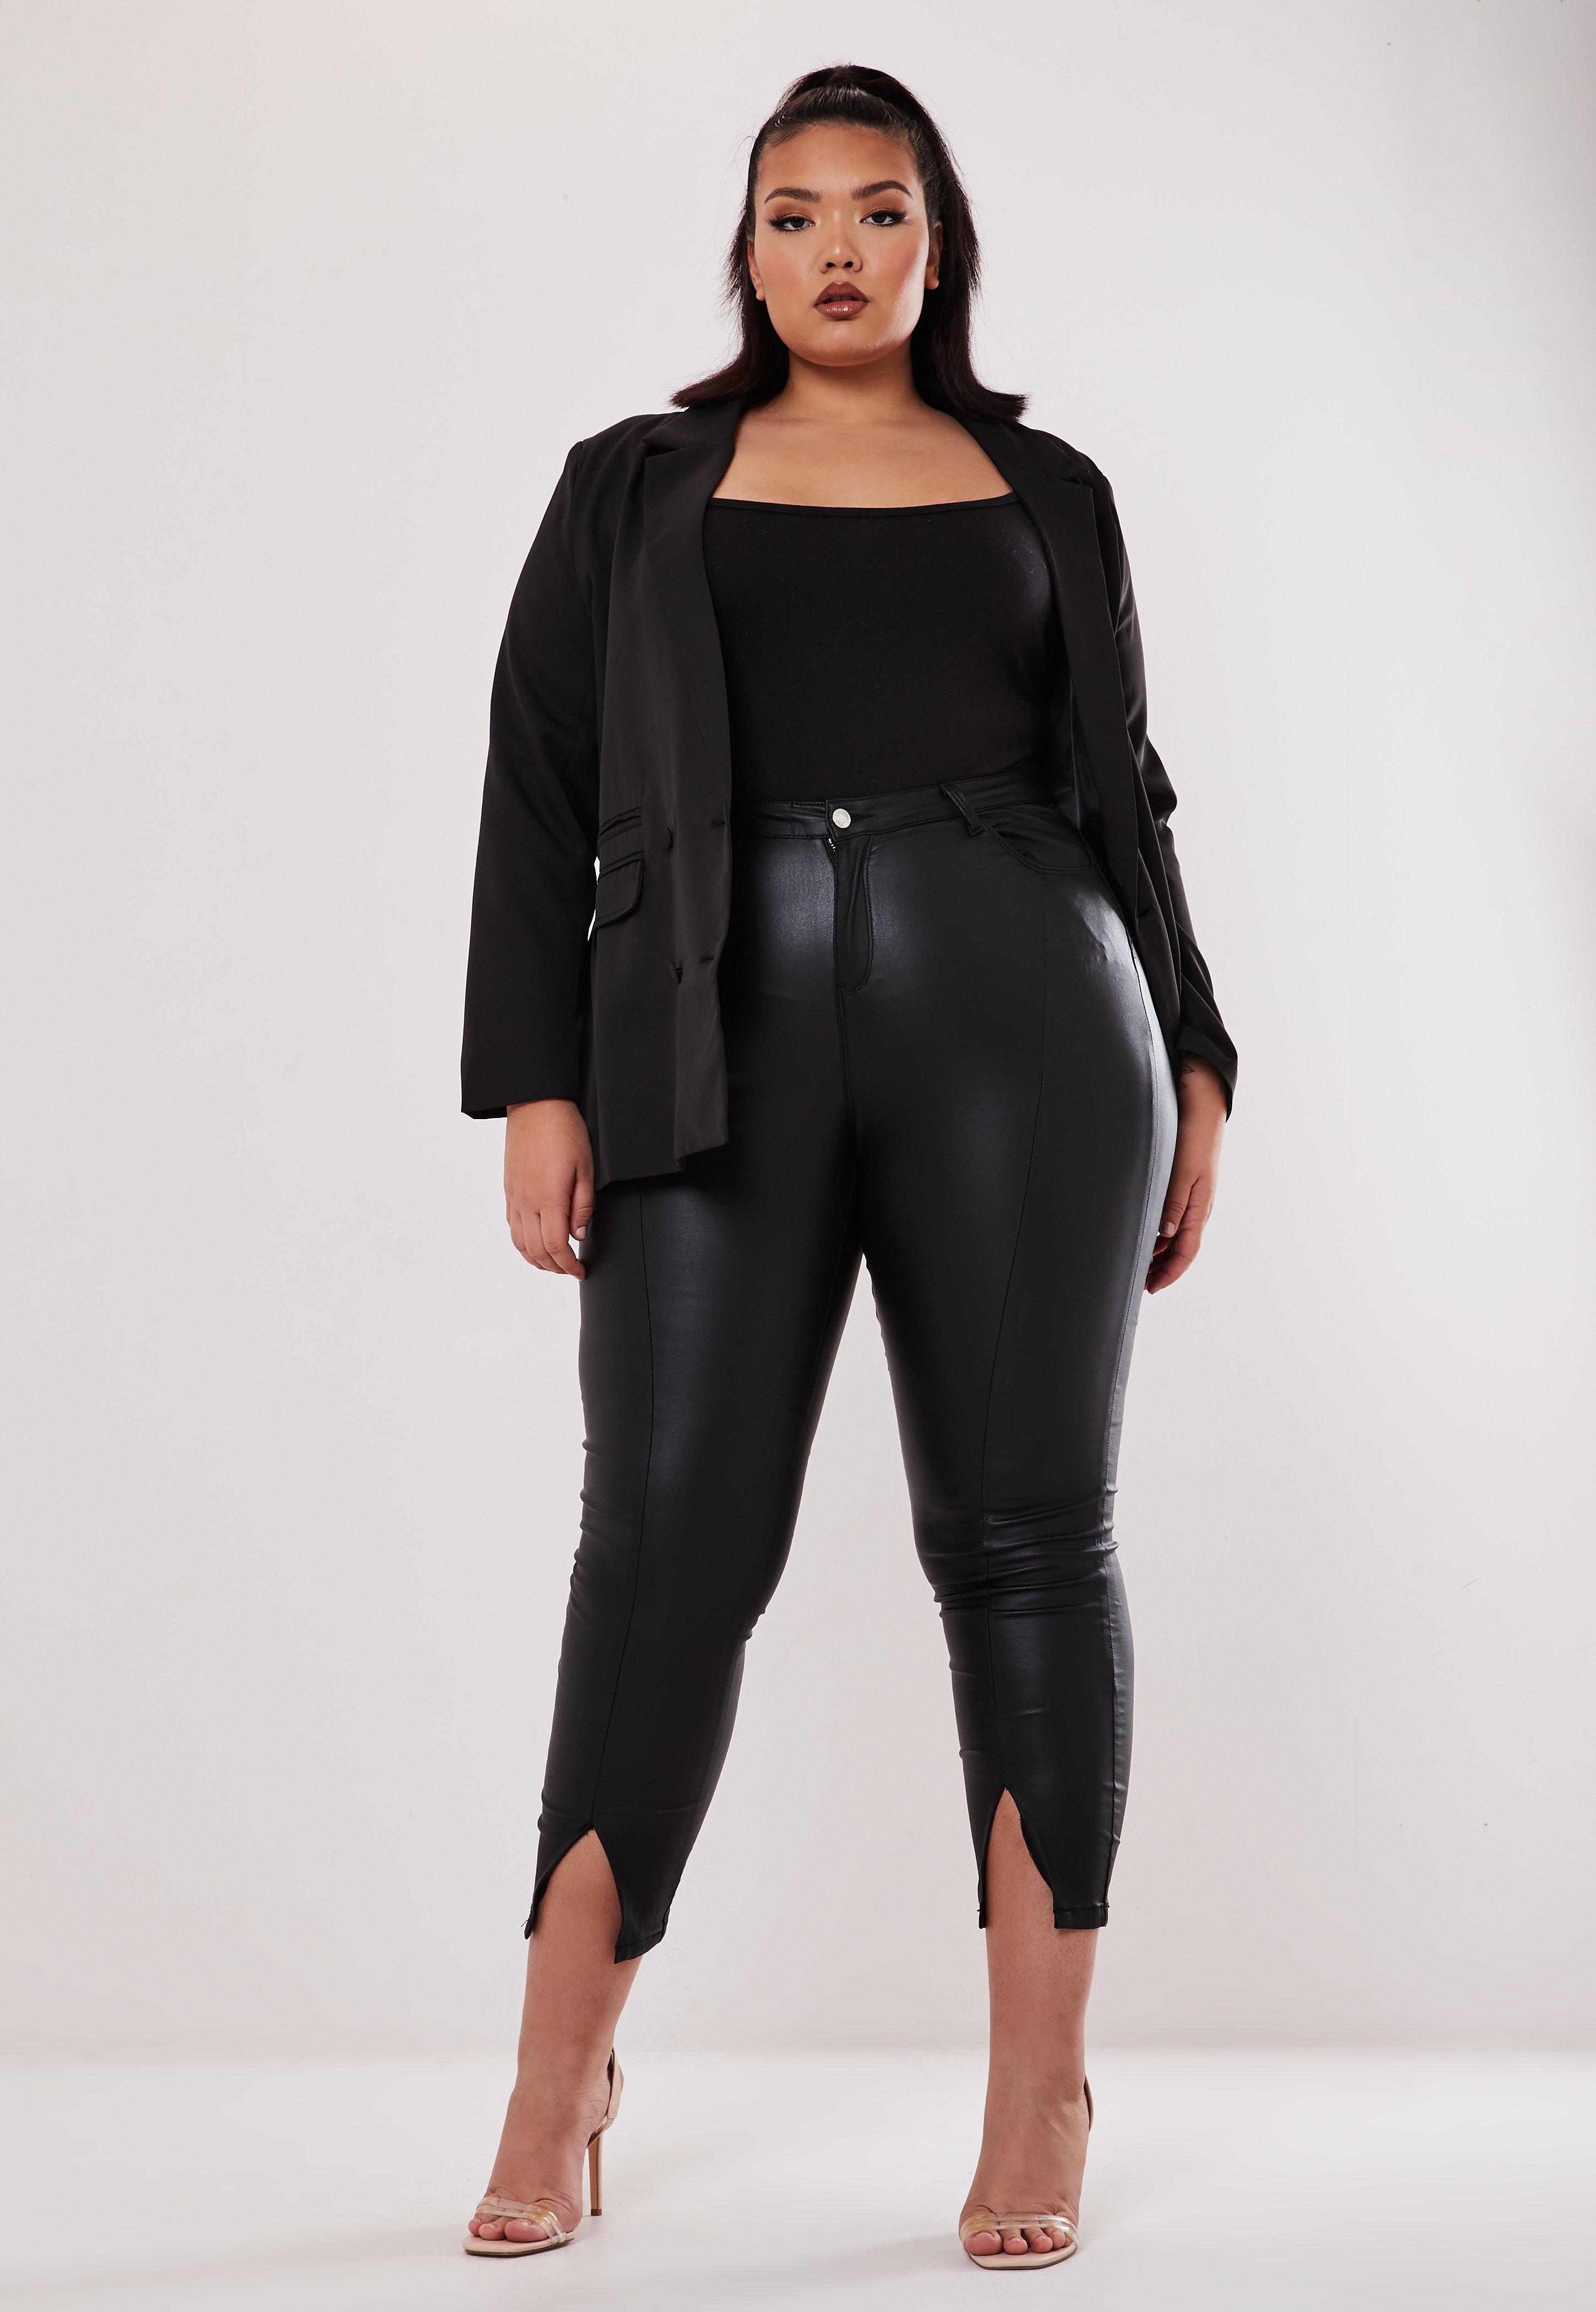 cheapest exclusive shoes sold worldwide Pantalon noir style cuir taille haute Grandes tailles